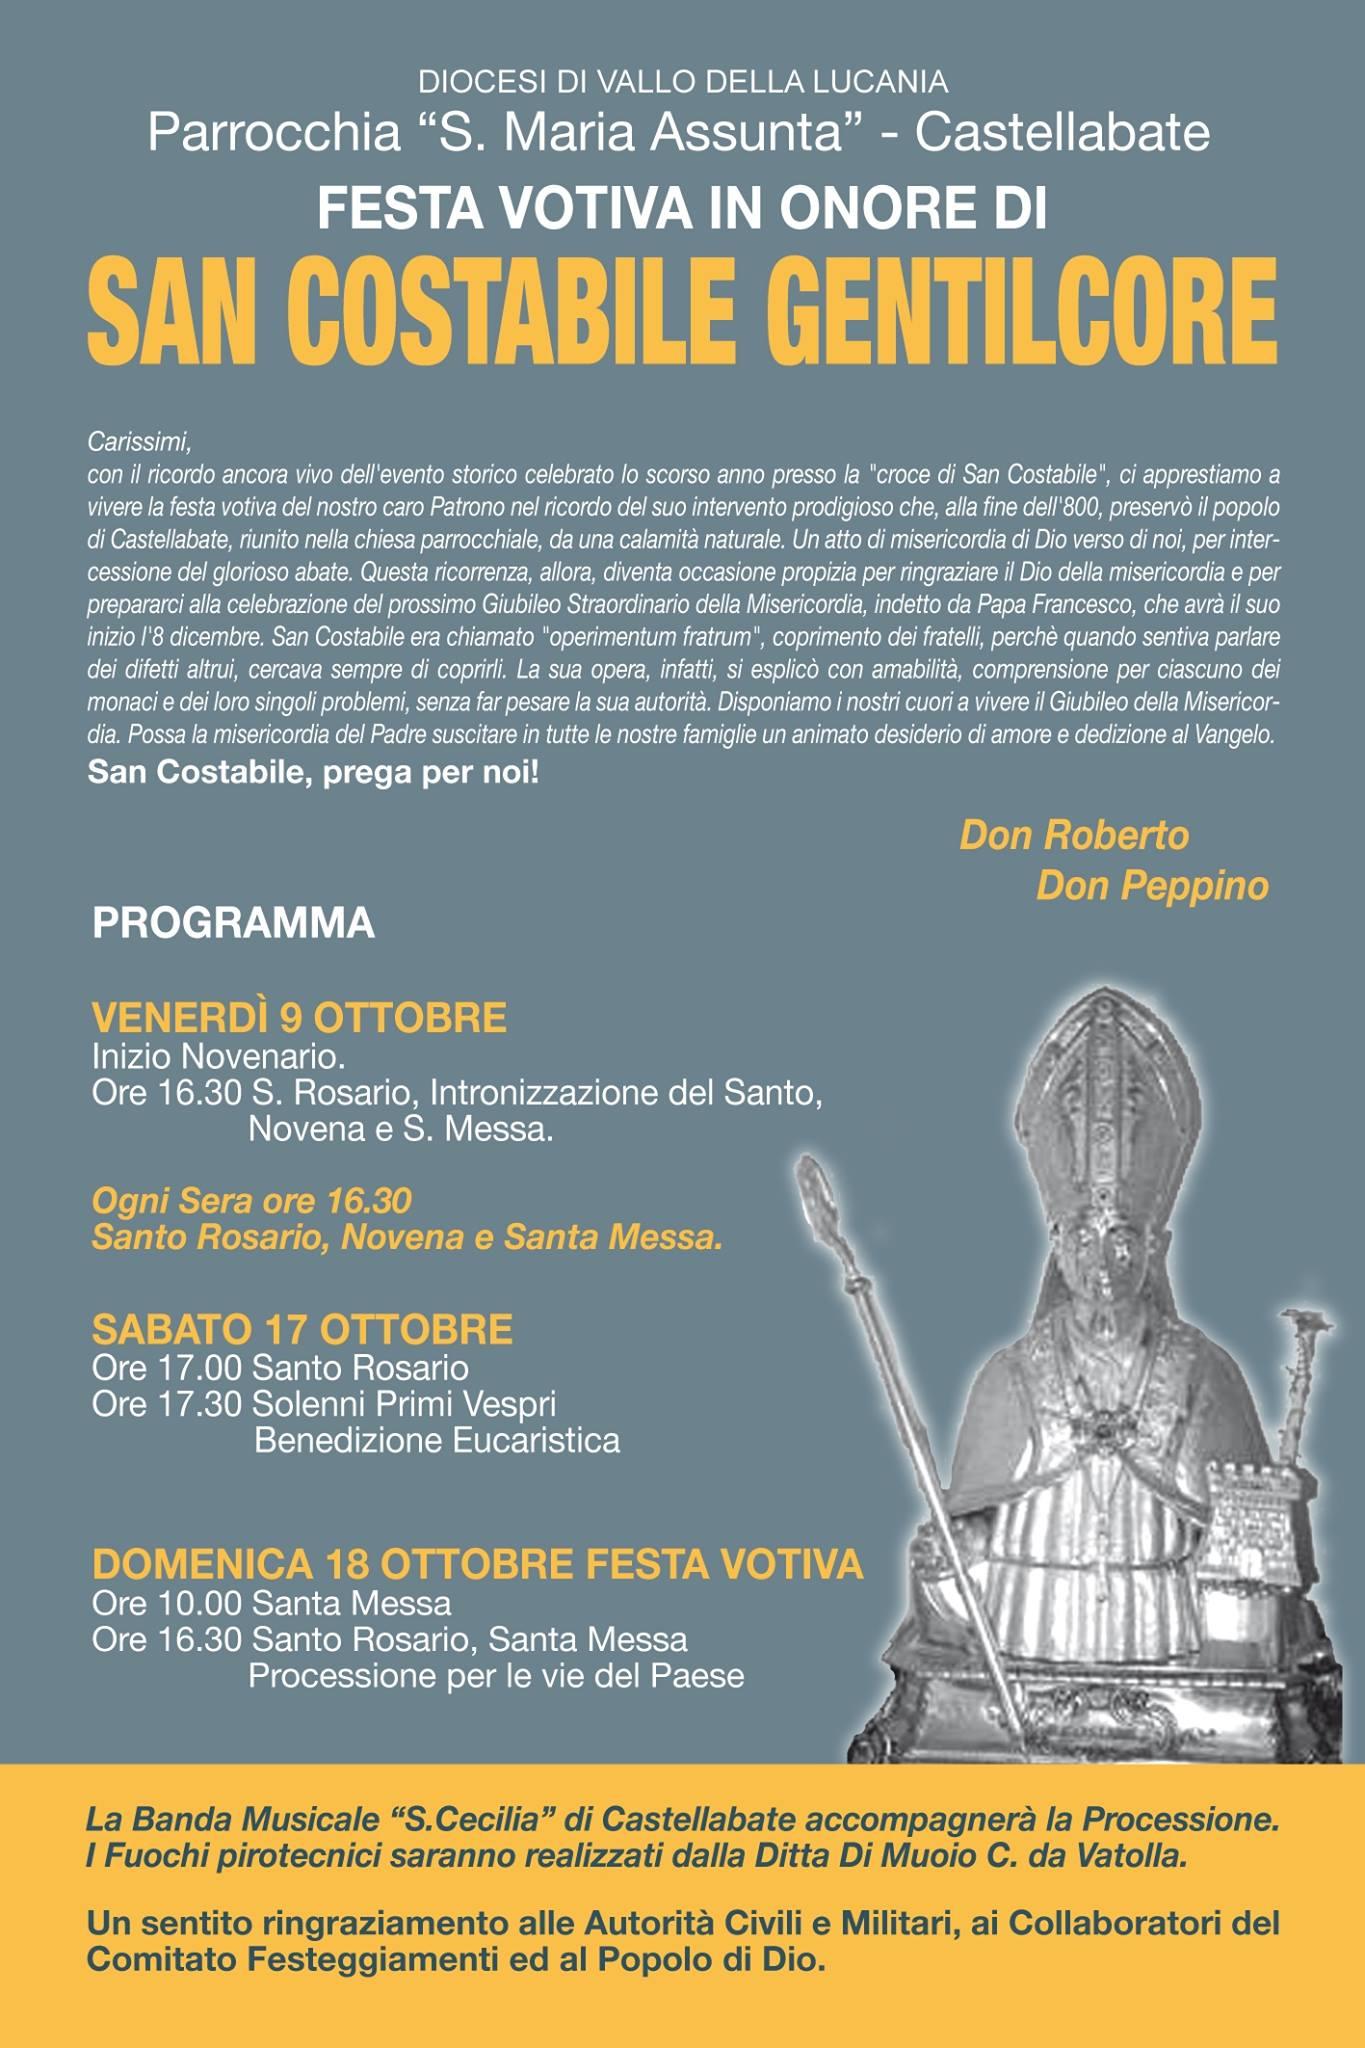 Castellabate Festa votiva di San Costabile Gentilcore 2015